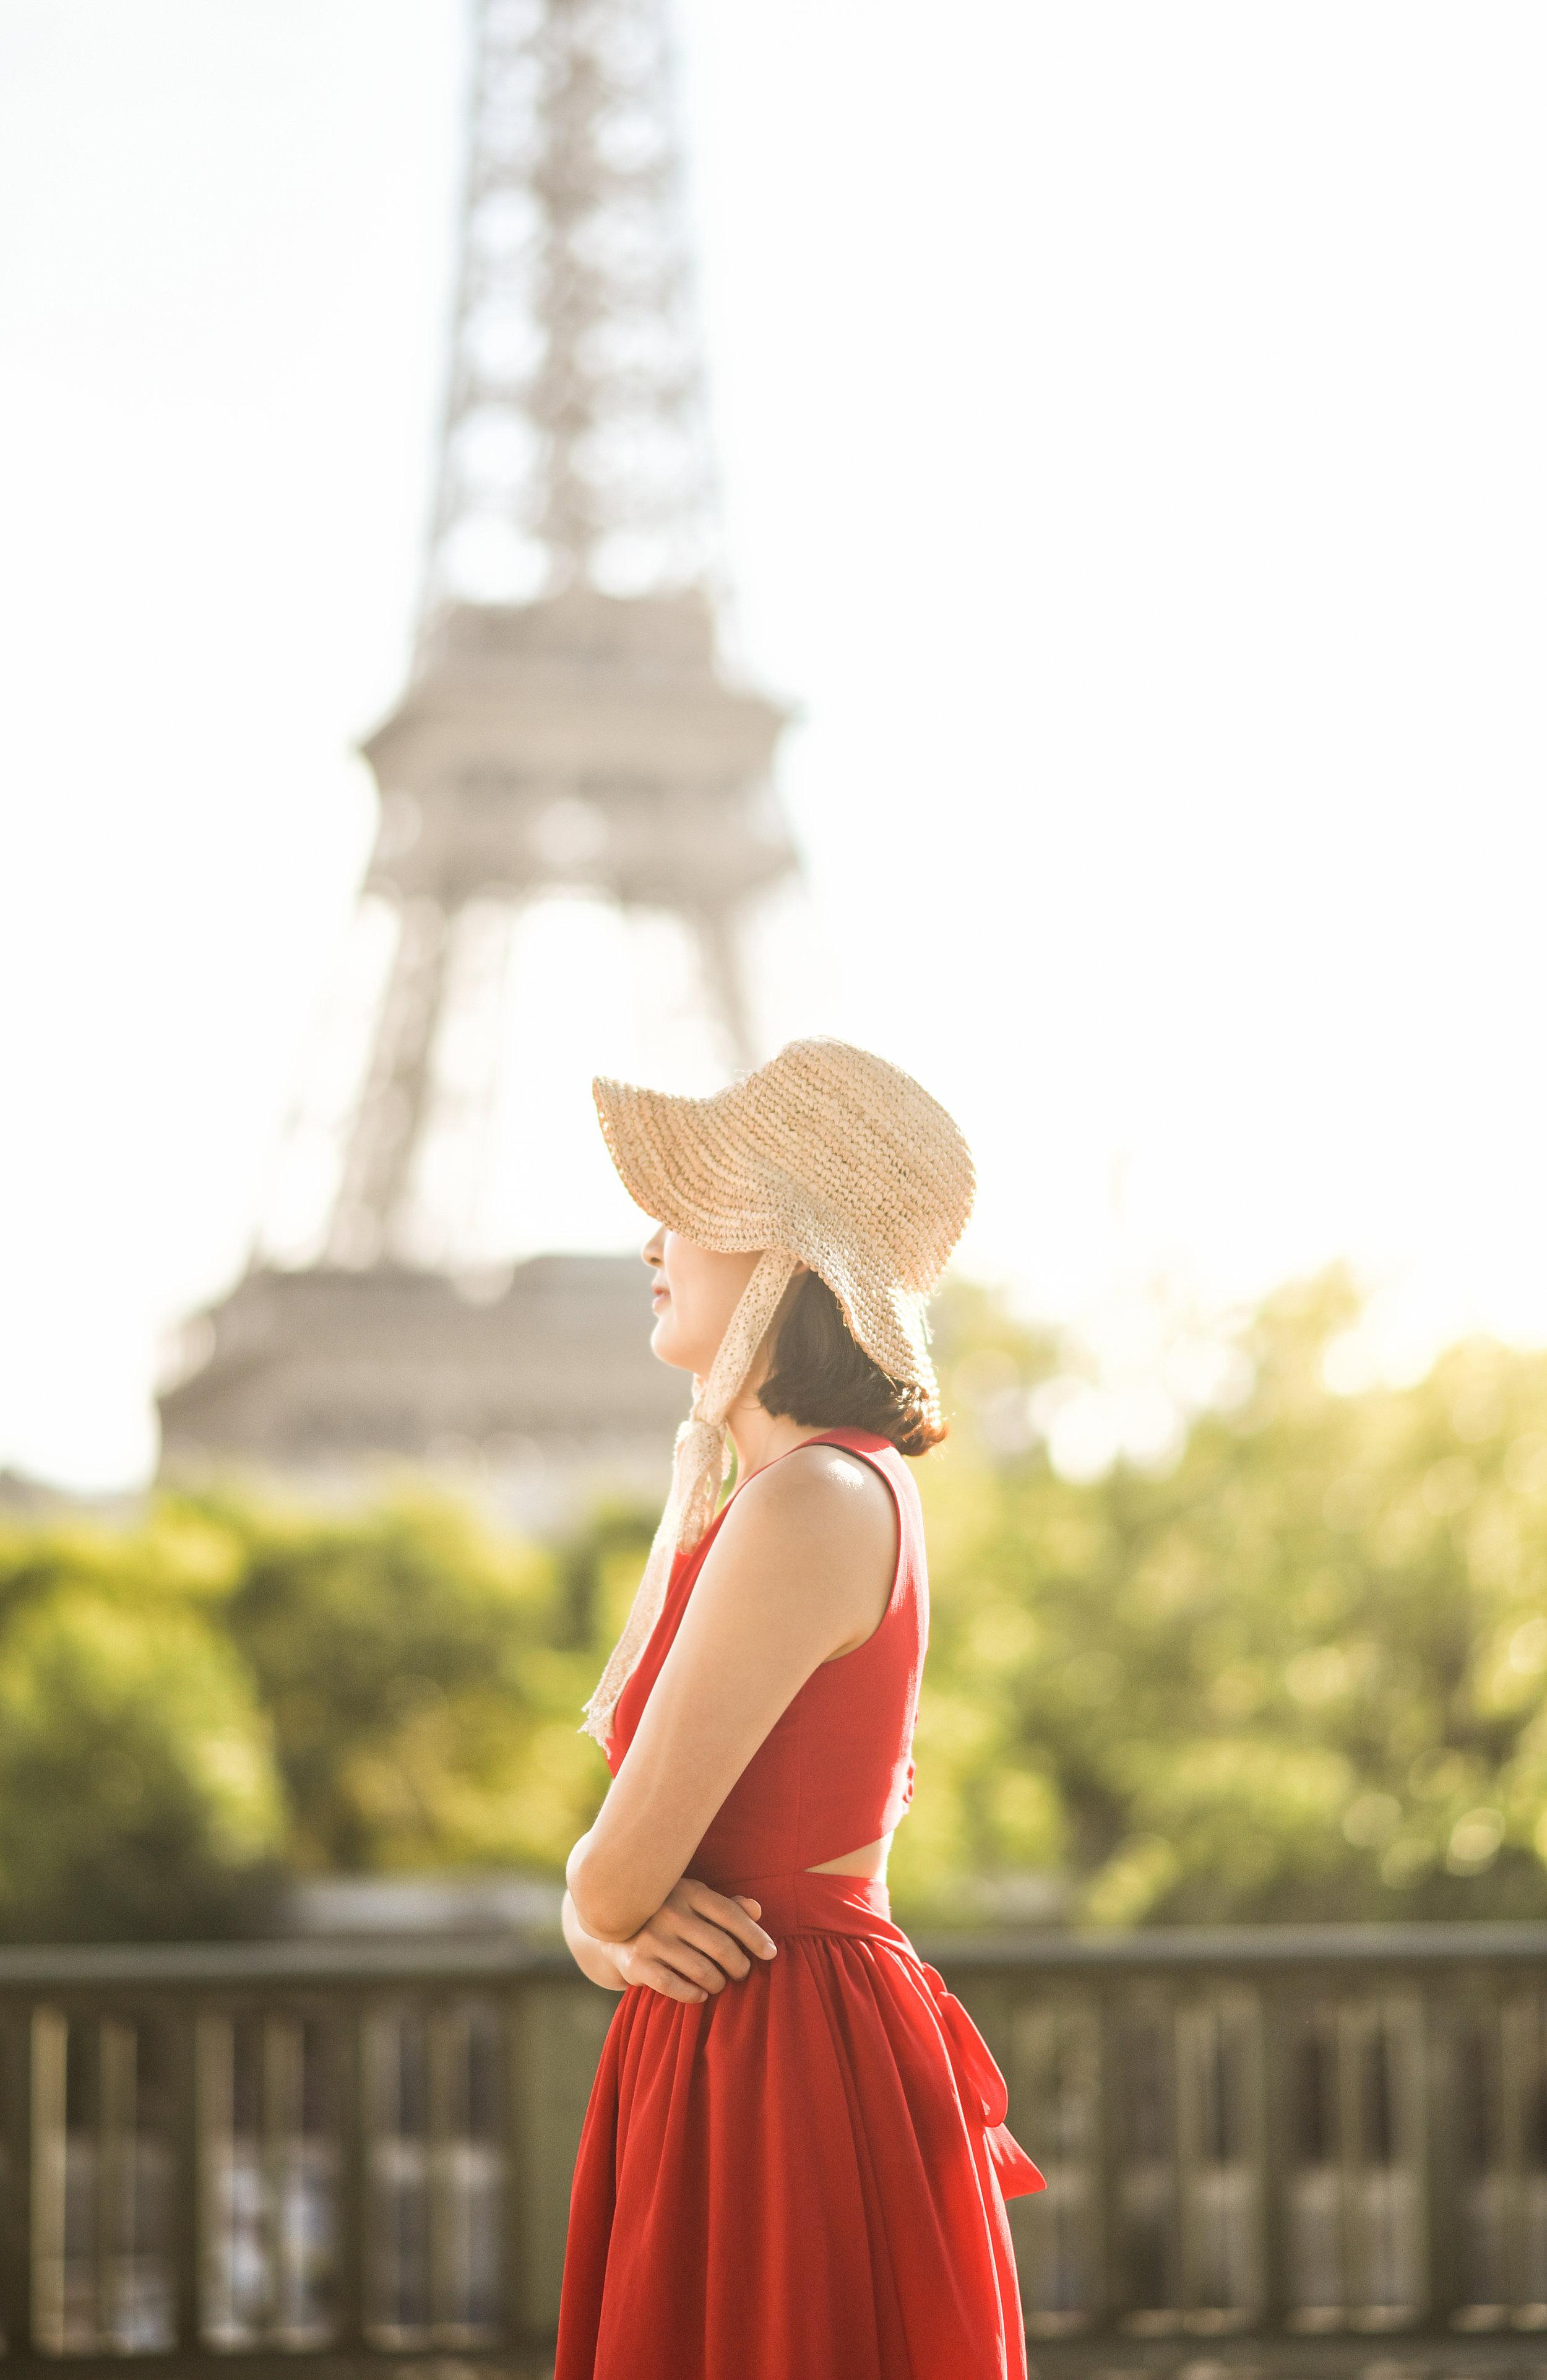 Sprazzi_Professional_Portrait_Photo_Paris_Kyunga_Original_33.jpg